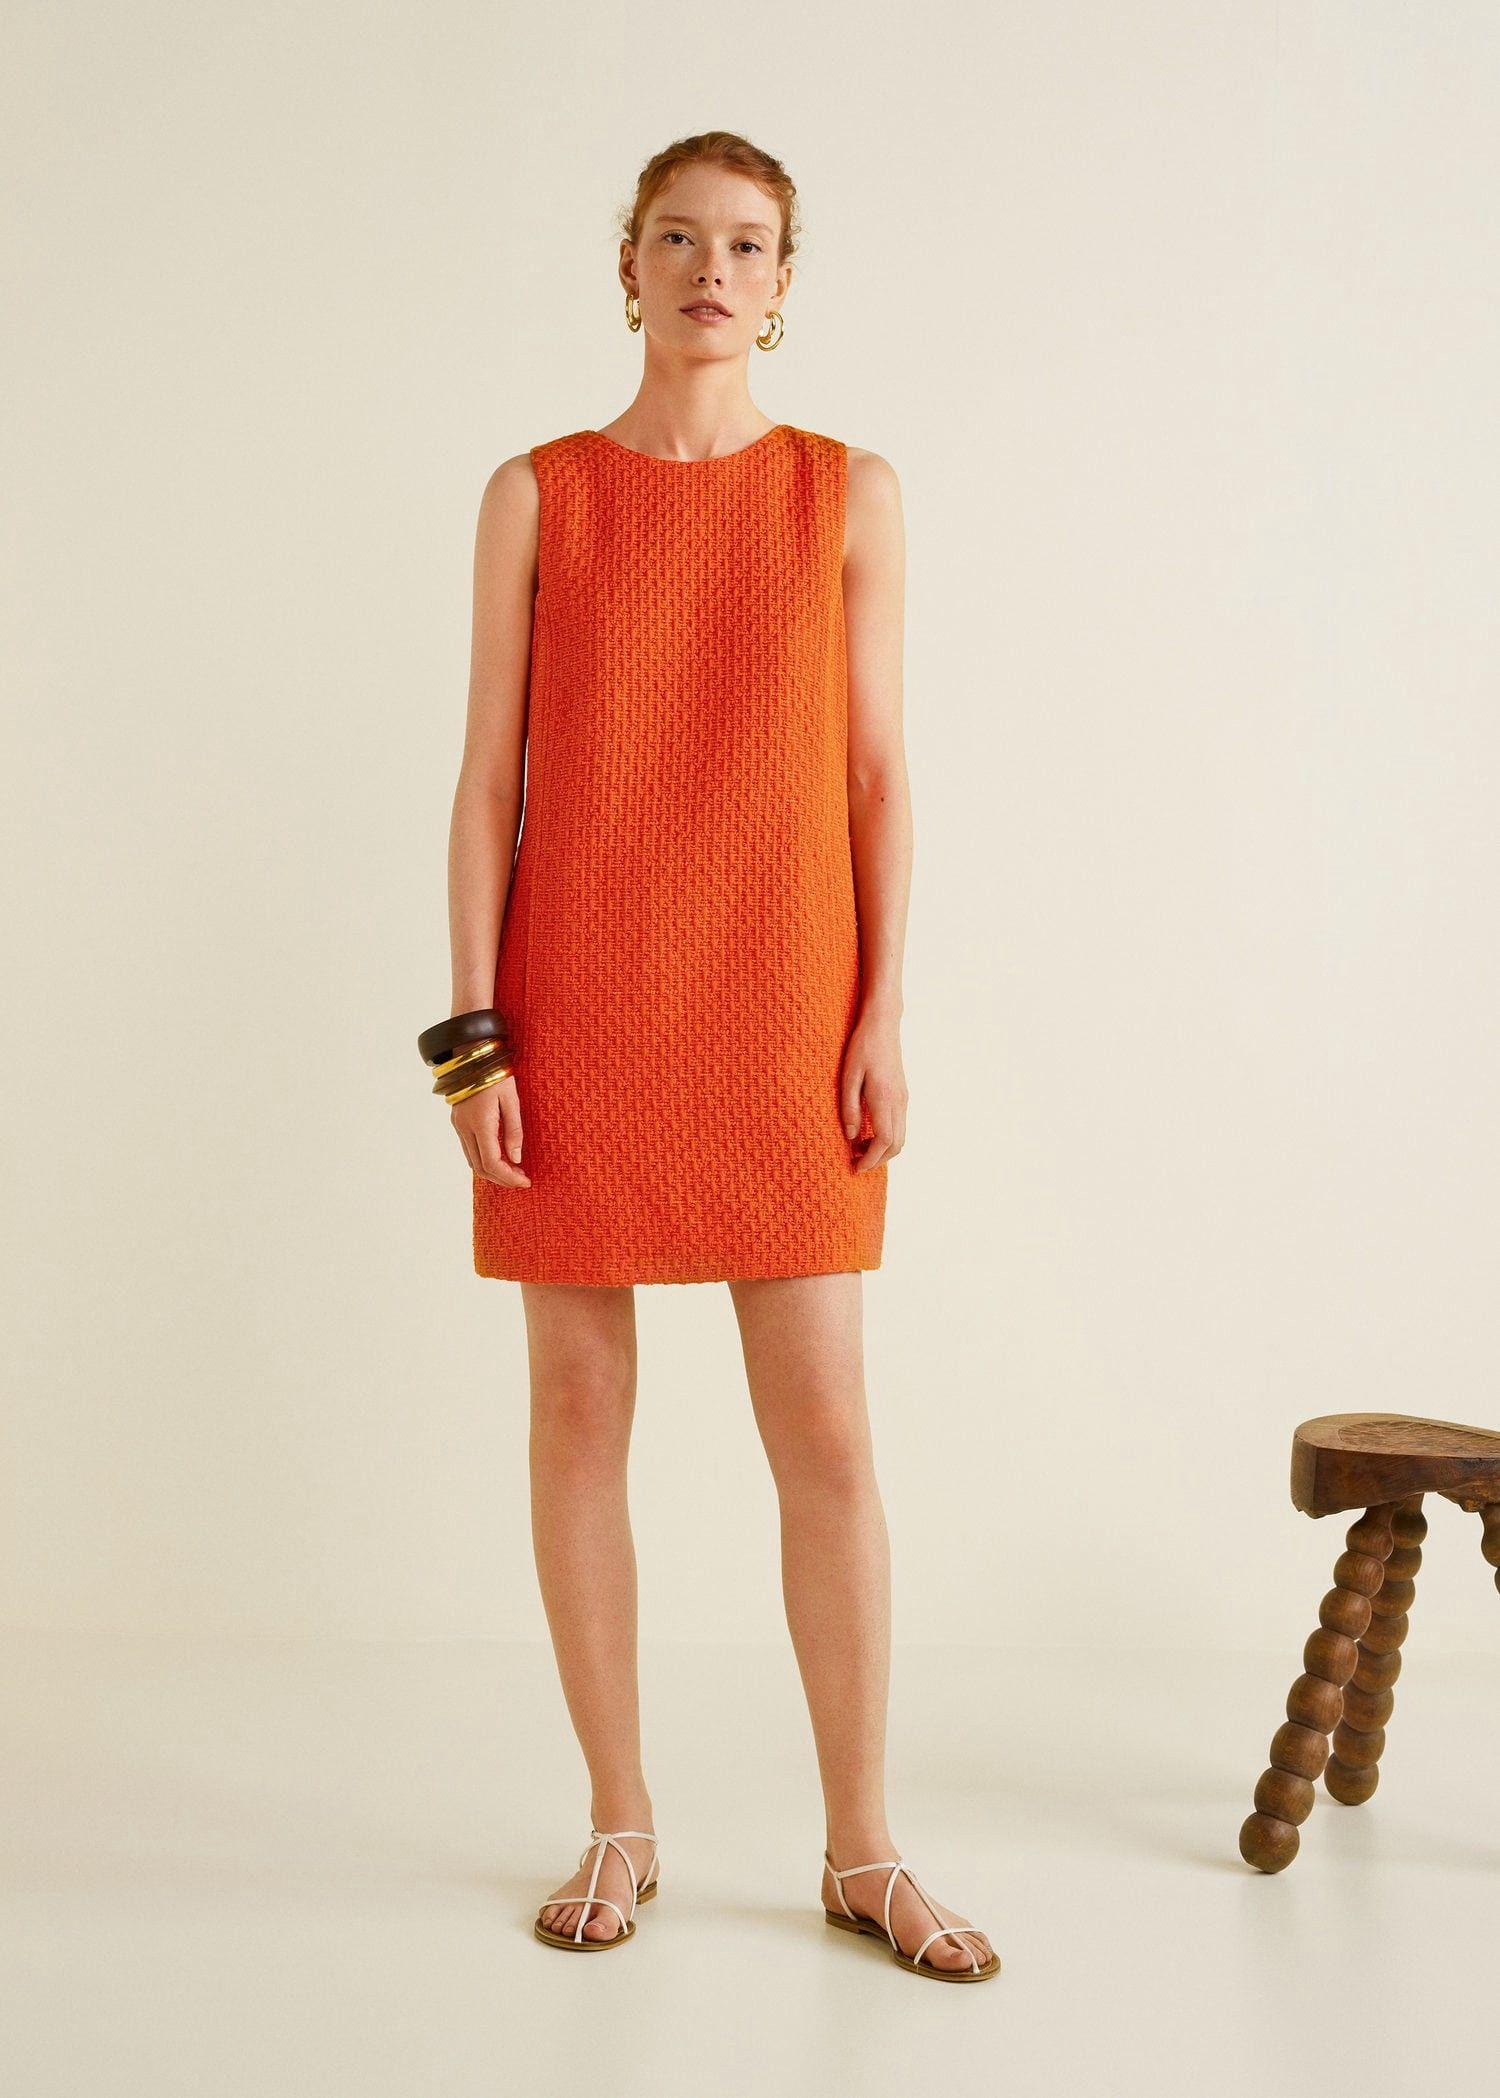 901d7fca38e0 Tweed dress by Mango